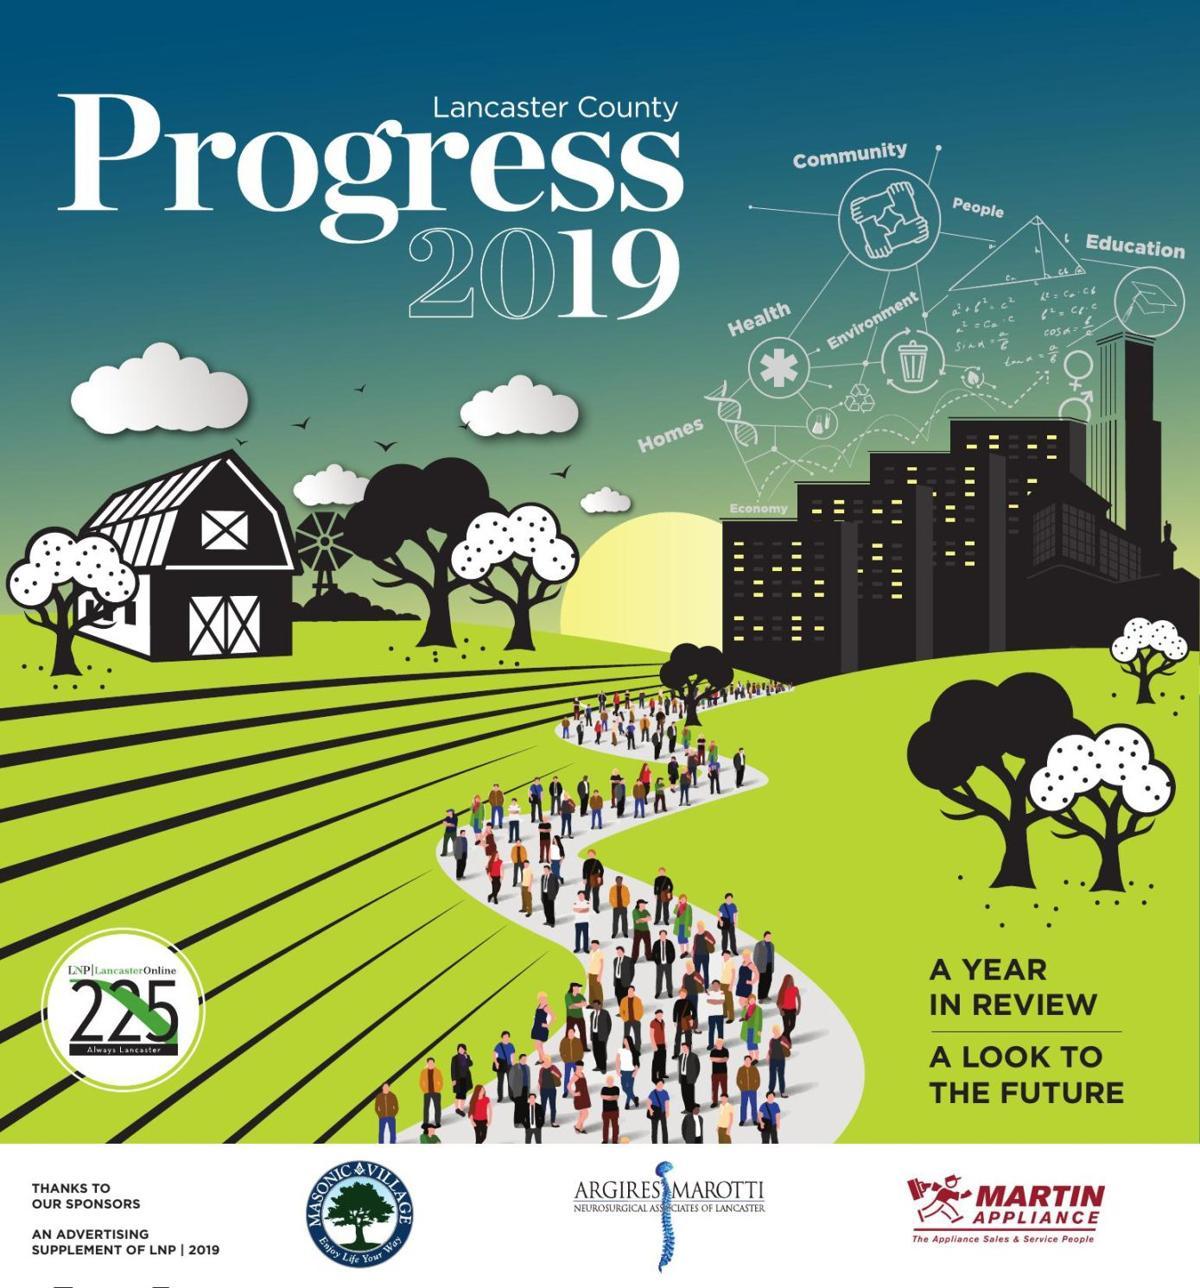 Lancaster County Progress 2019